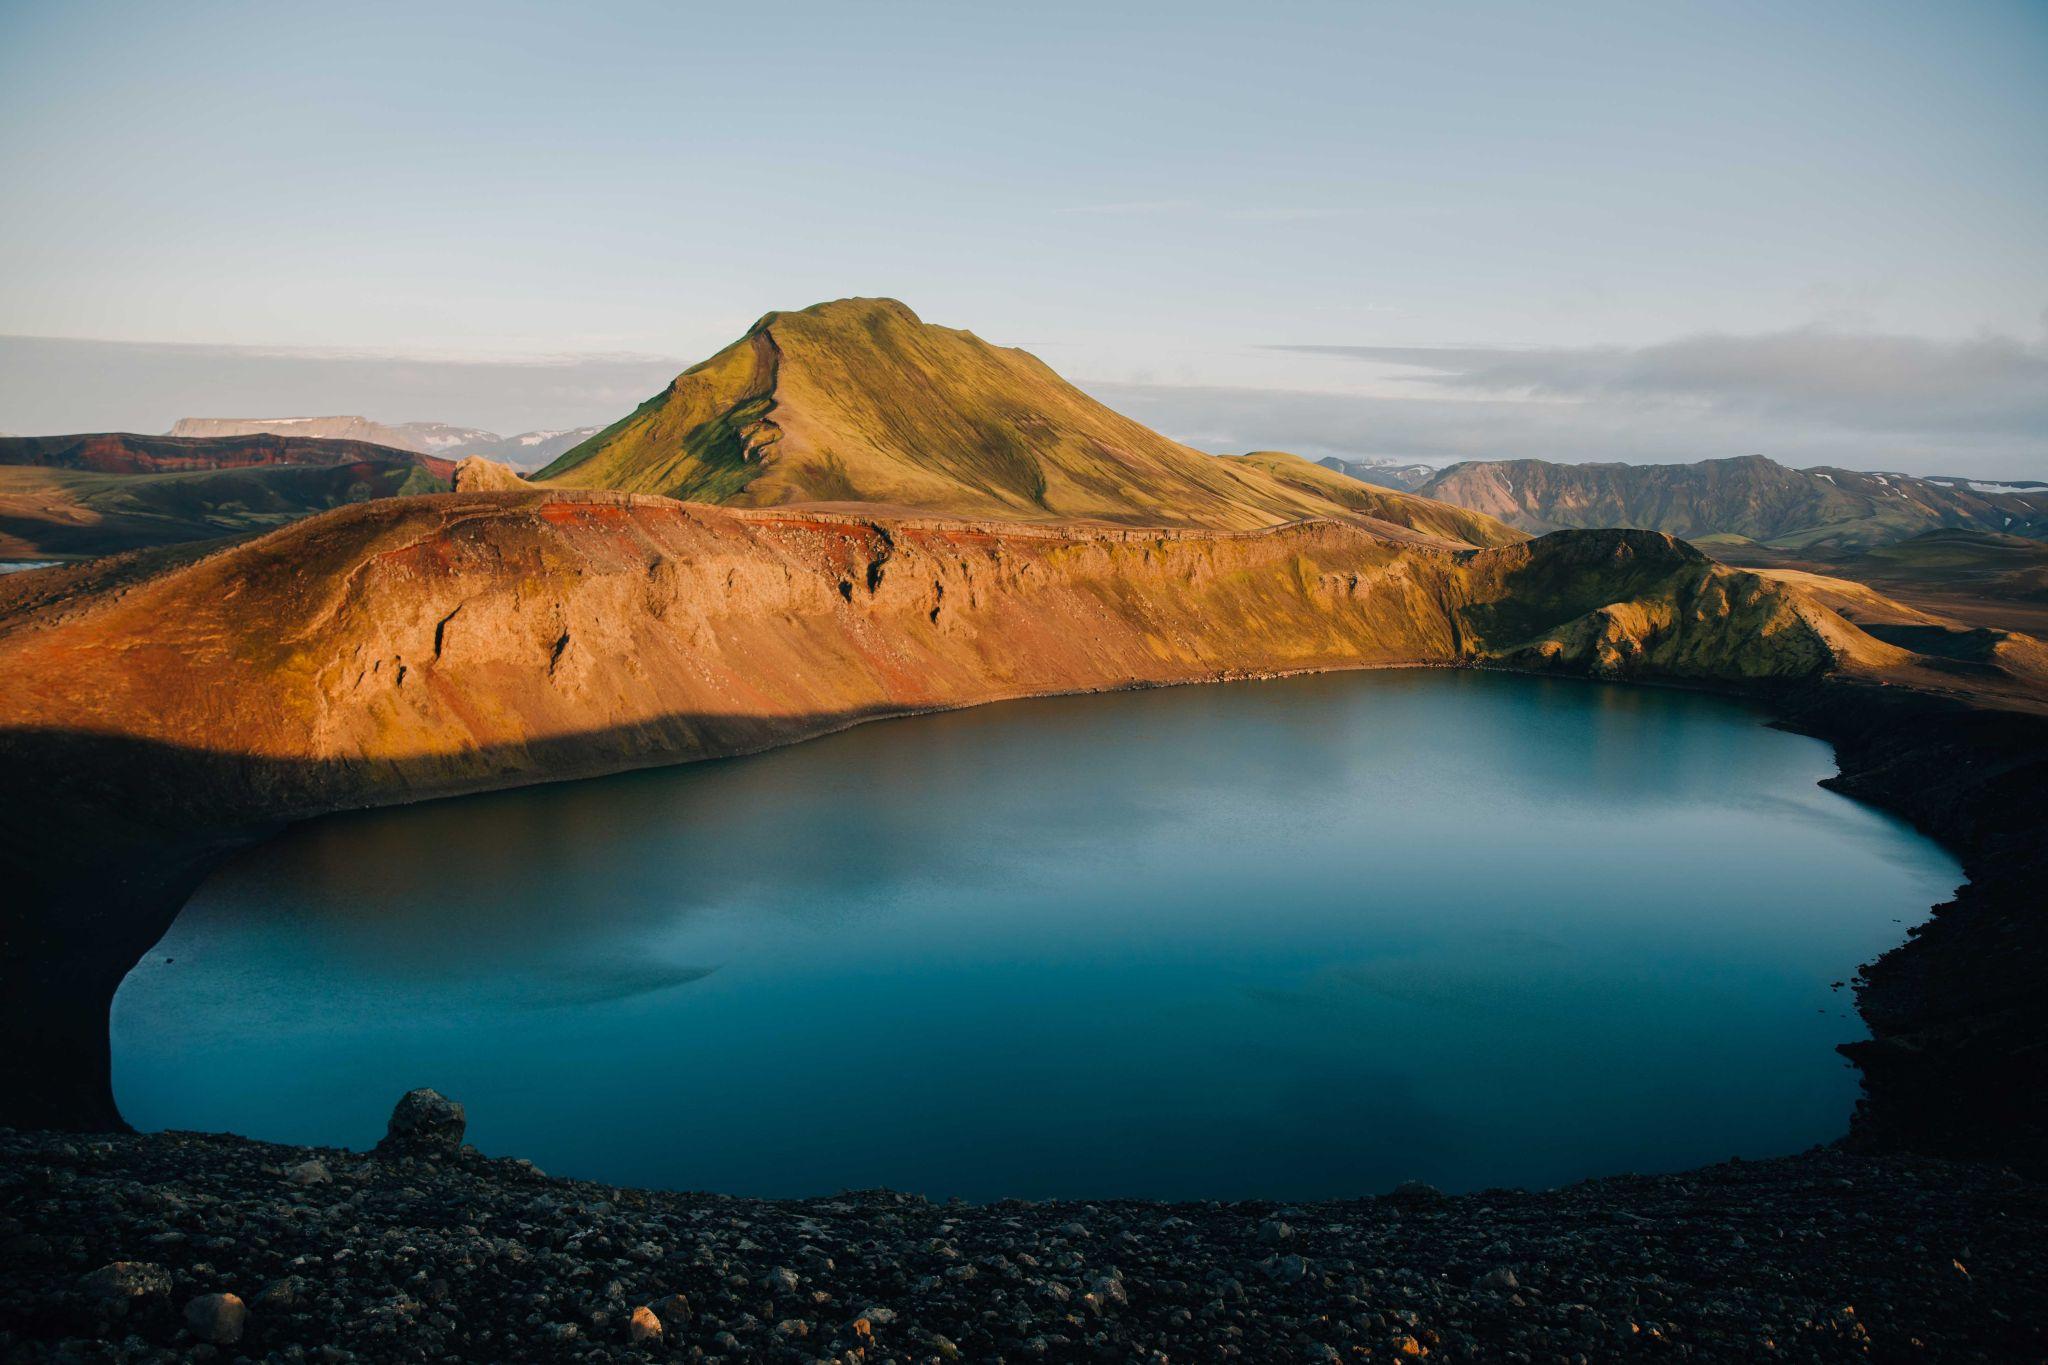 Bláhylur (Hnausapollur), Iceland